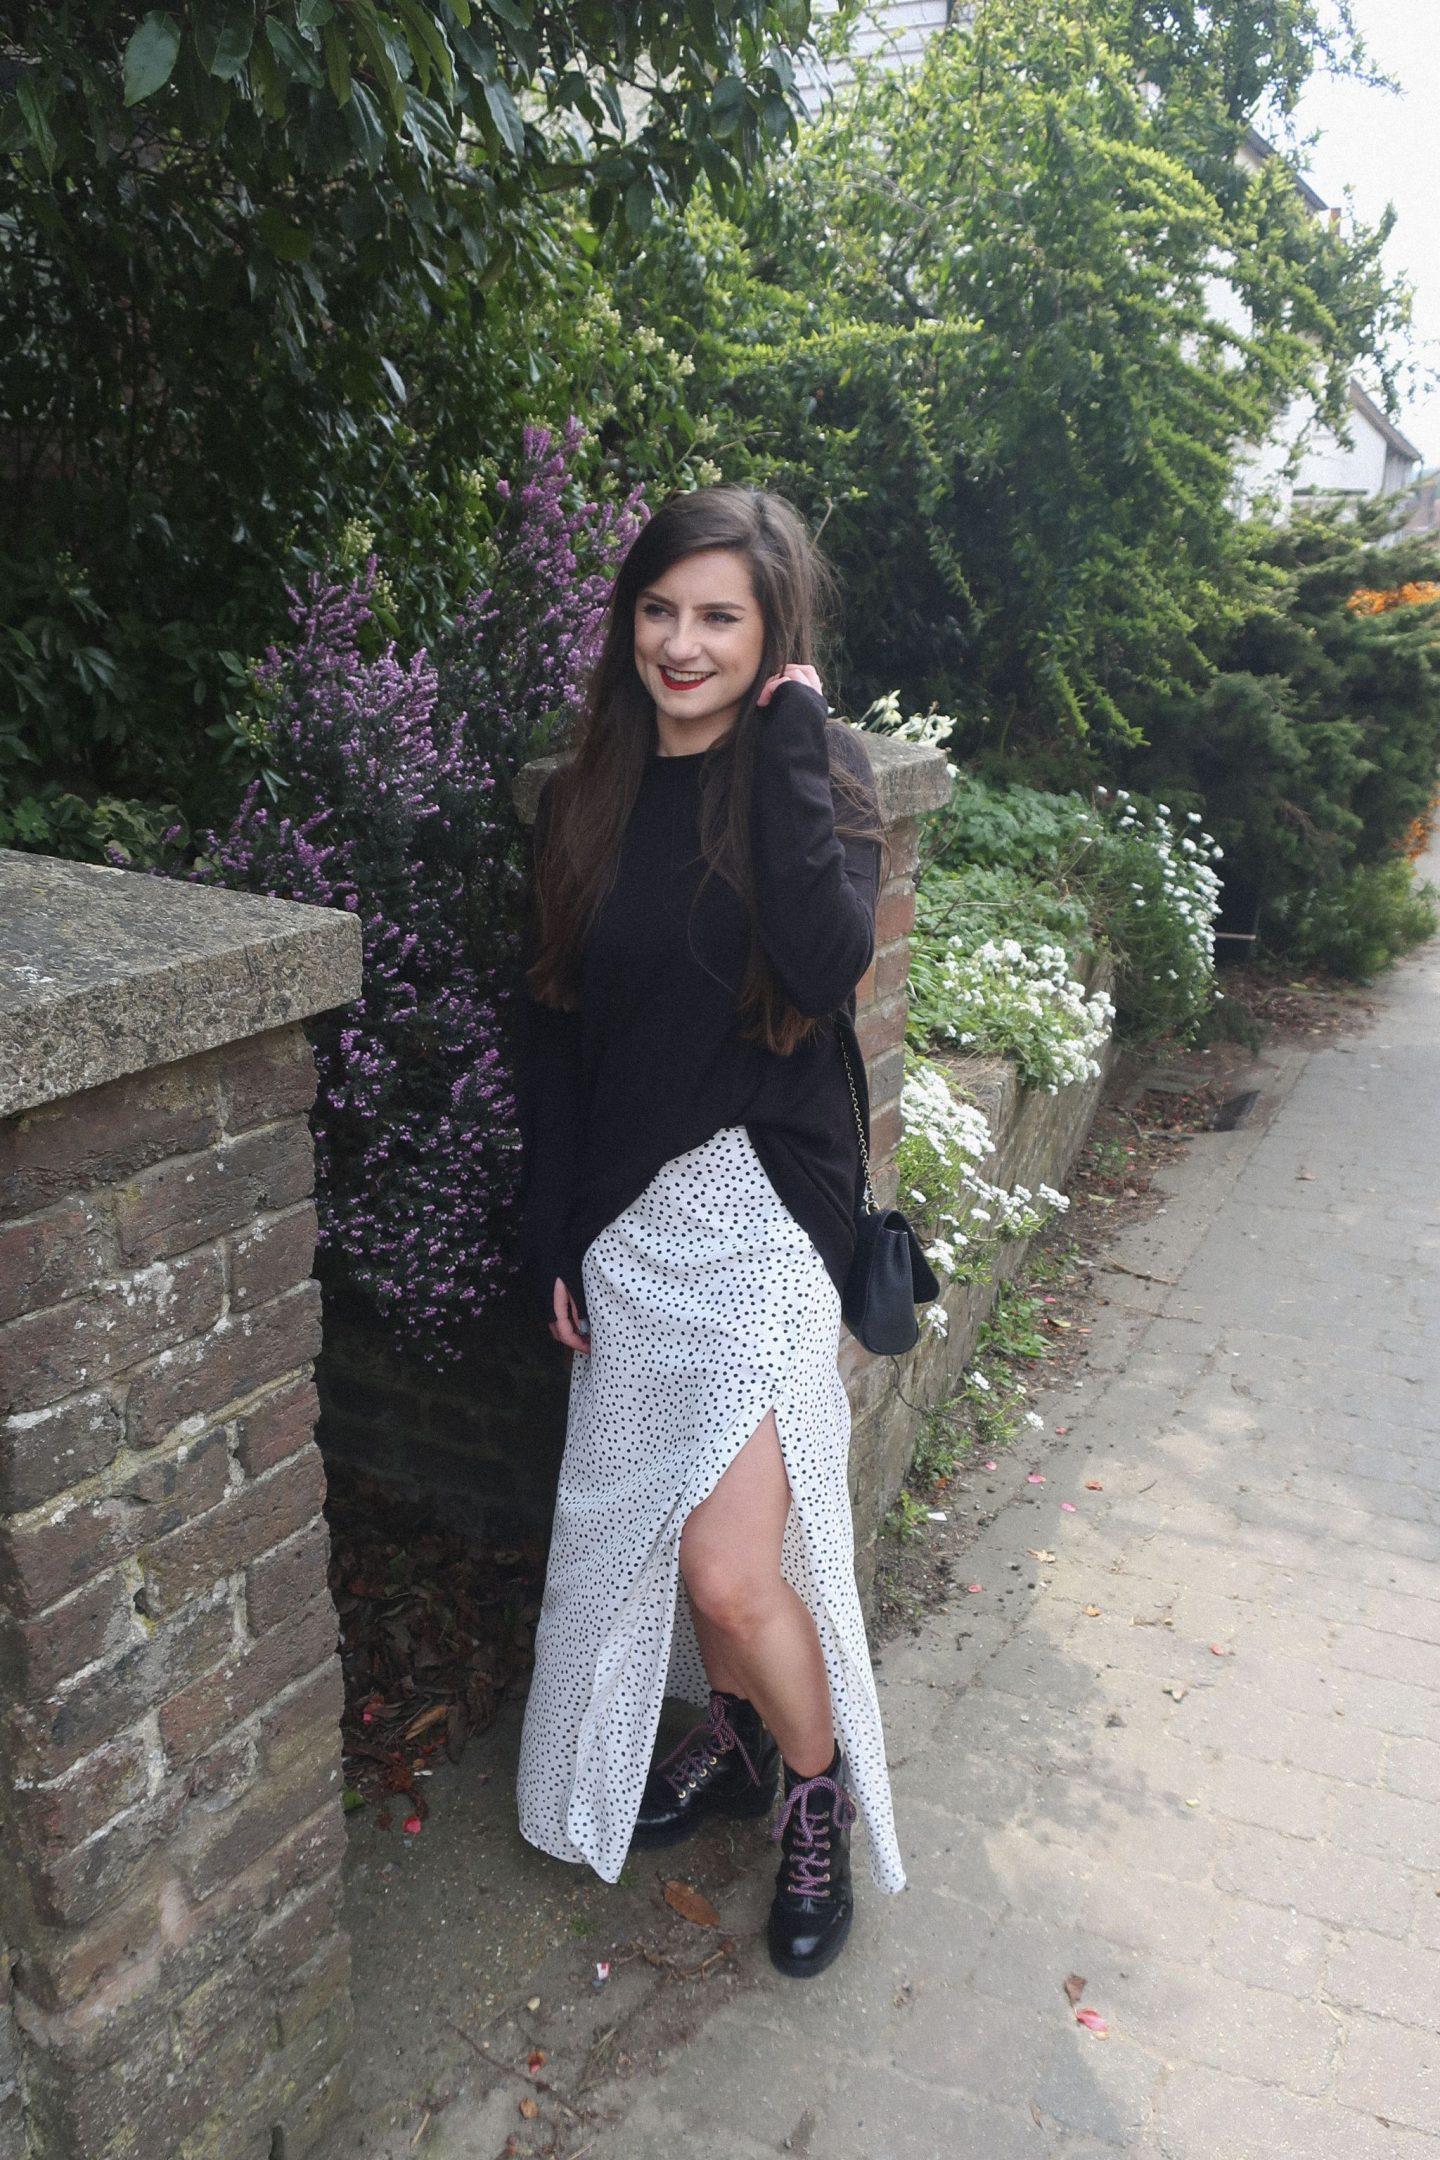 girl with brown hair in polka dot skirt